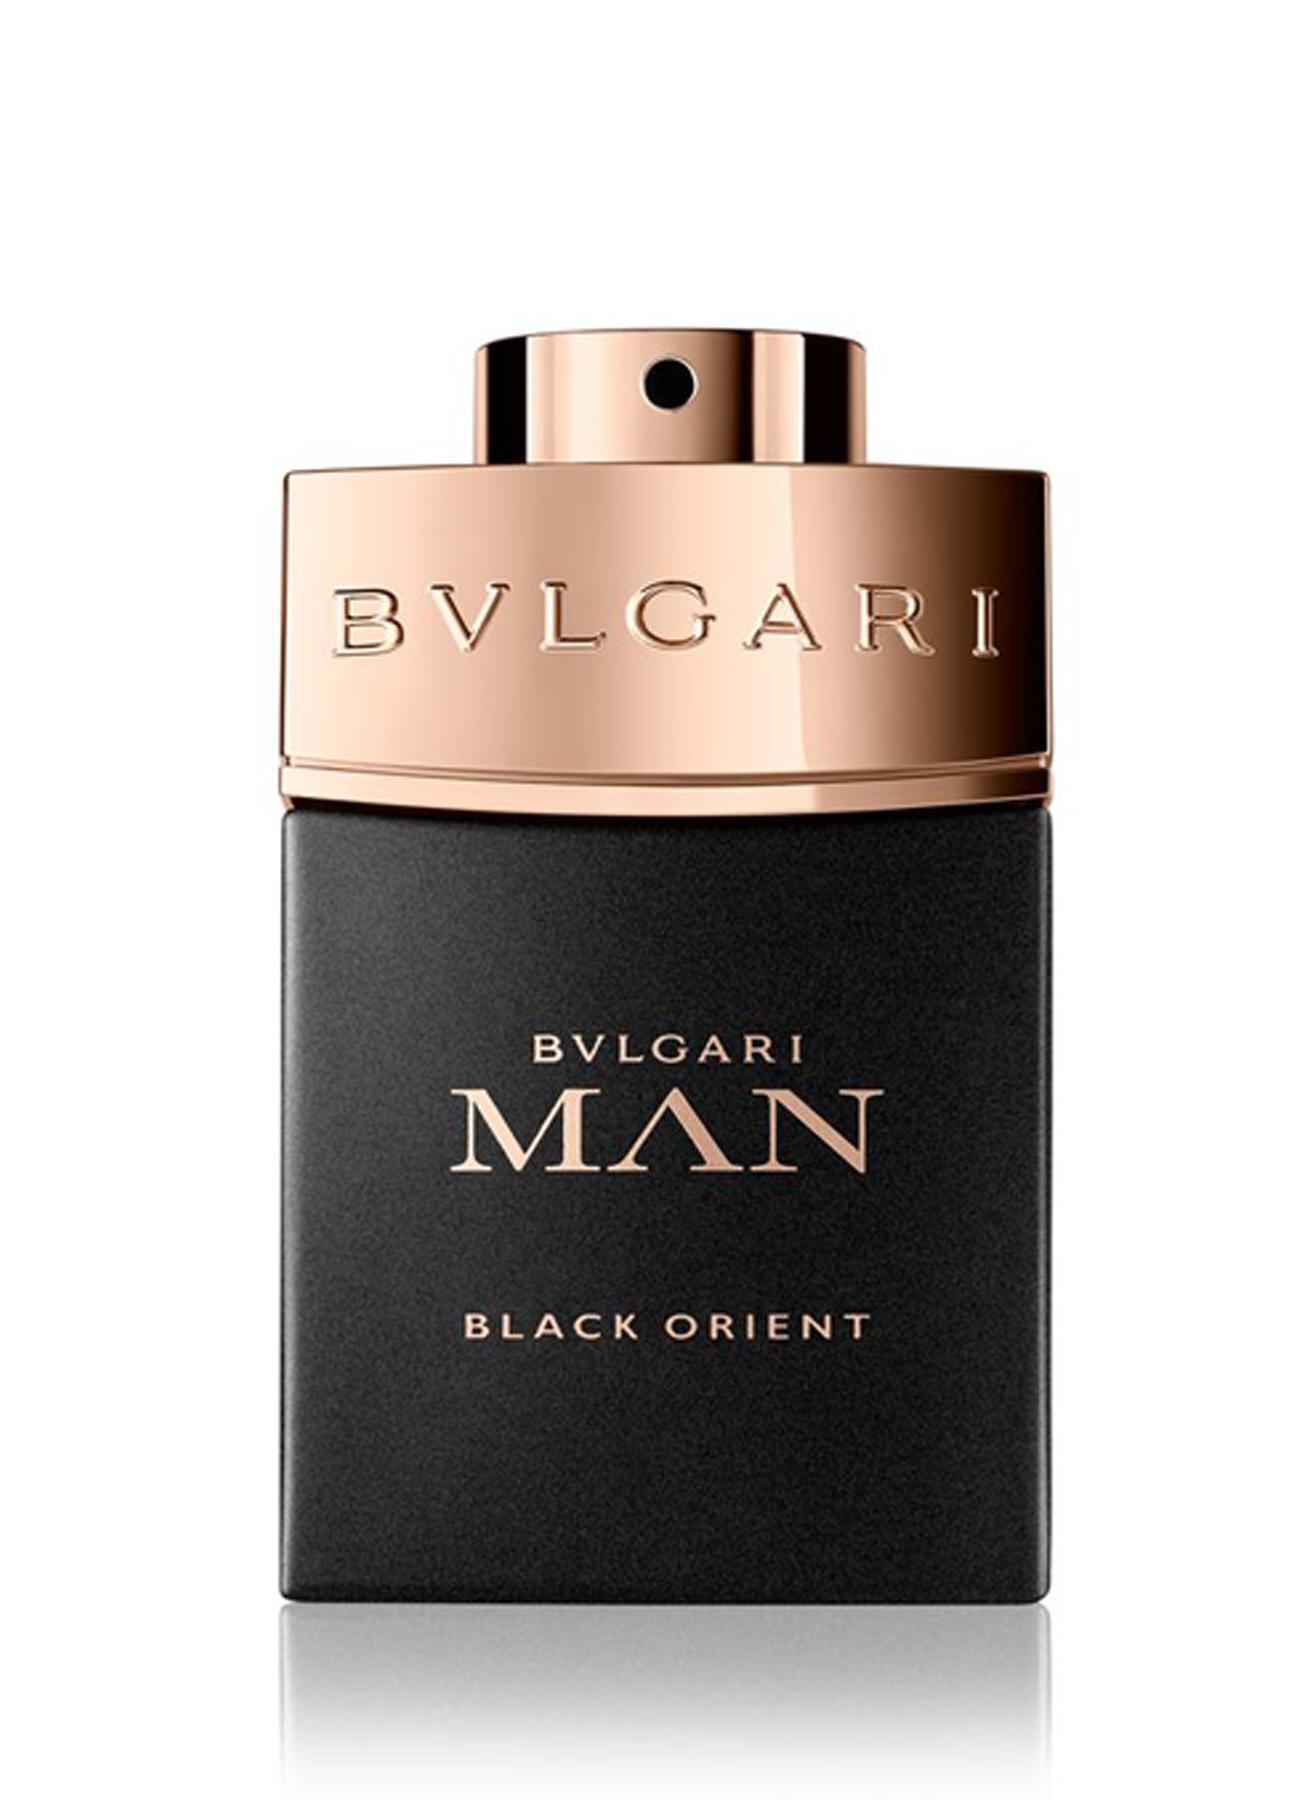 Bvlgari Black Orient Edt 60 ml Erkek Parfüm 5000136522001 Ürün Resmi